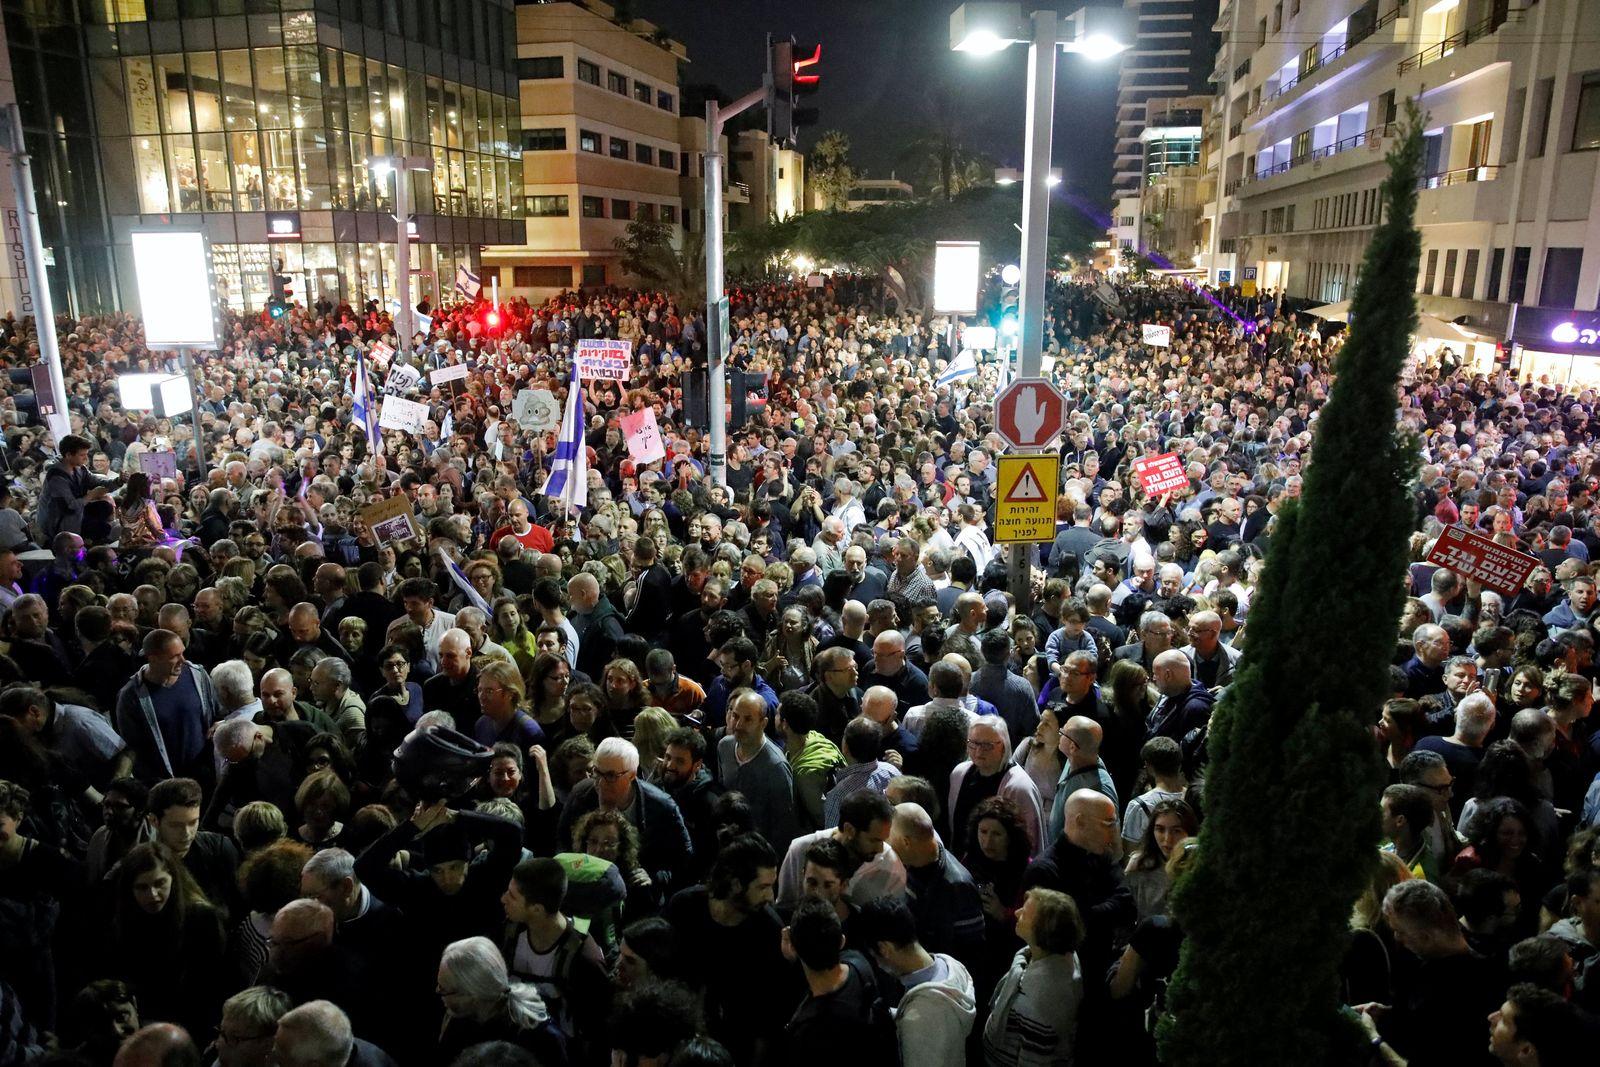 ISRAEL-NETANYAHU/PROTESTS